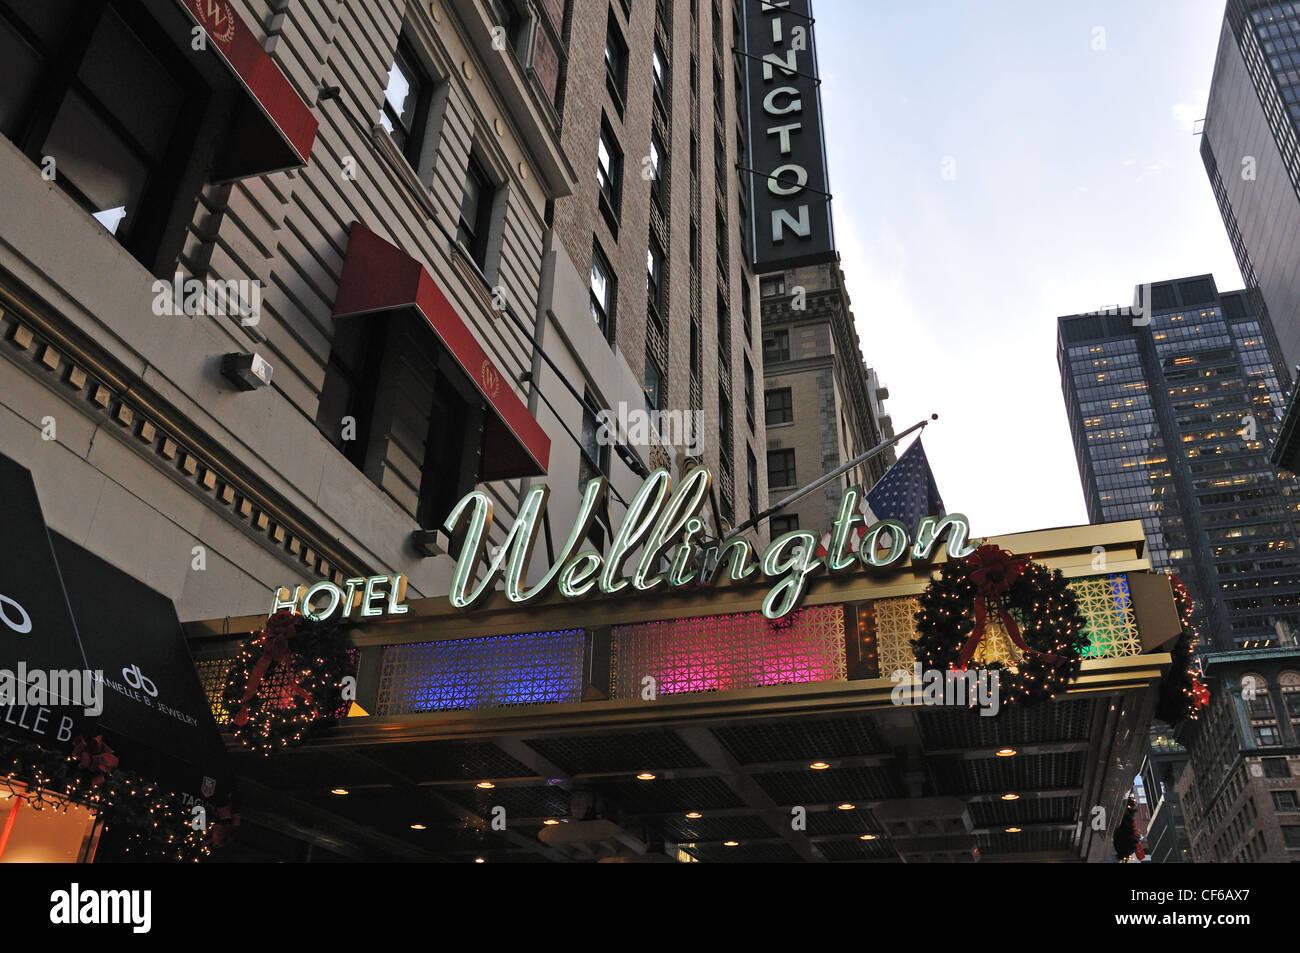 the wellington hotel manhattan new york usa stock photo. Black Bedroom Furniture Sets. Home Design Ideas